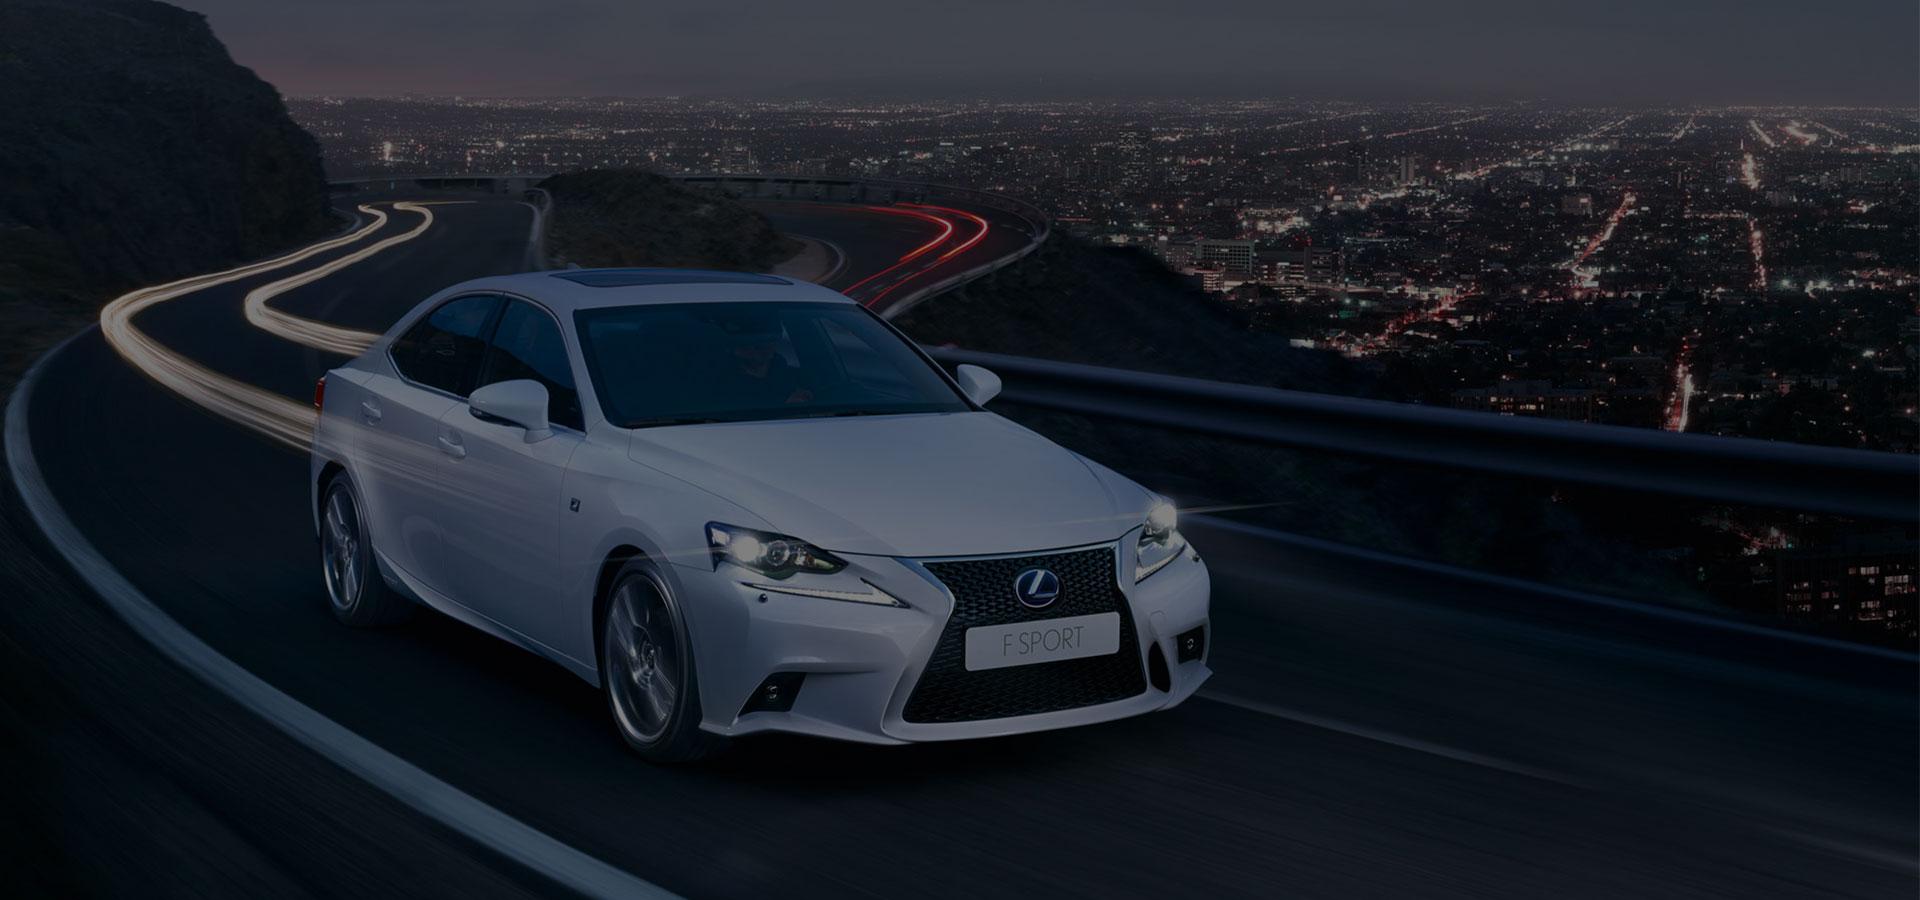 Rijdend zijaanzicht witte Lexus F Sport